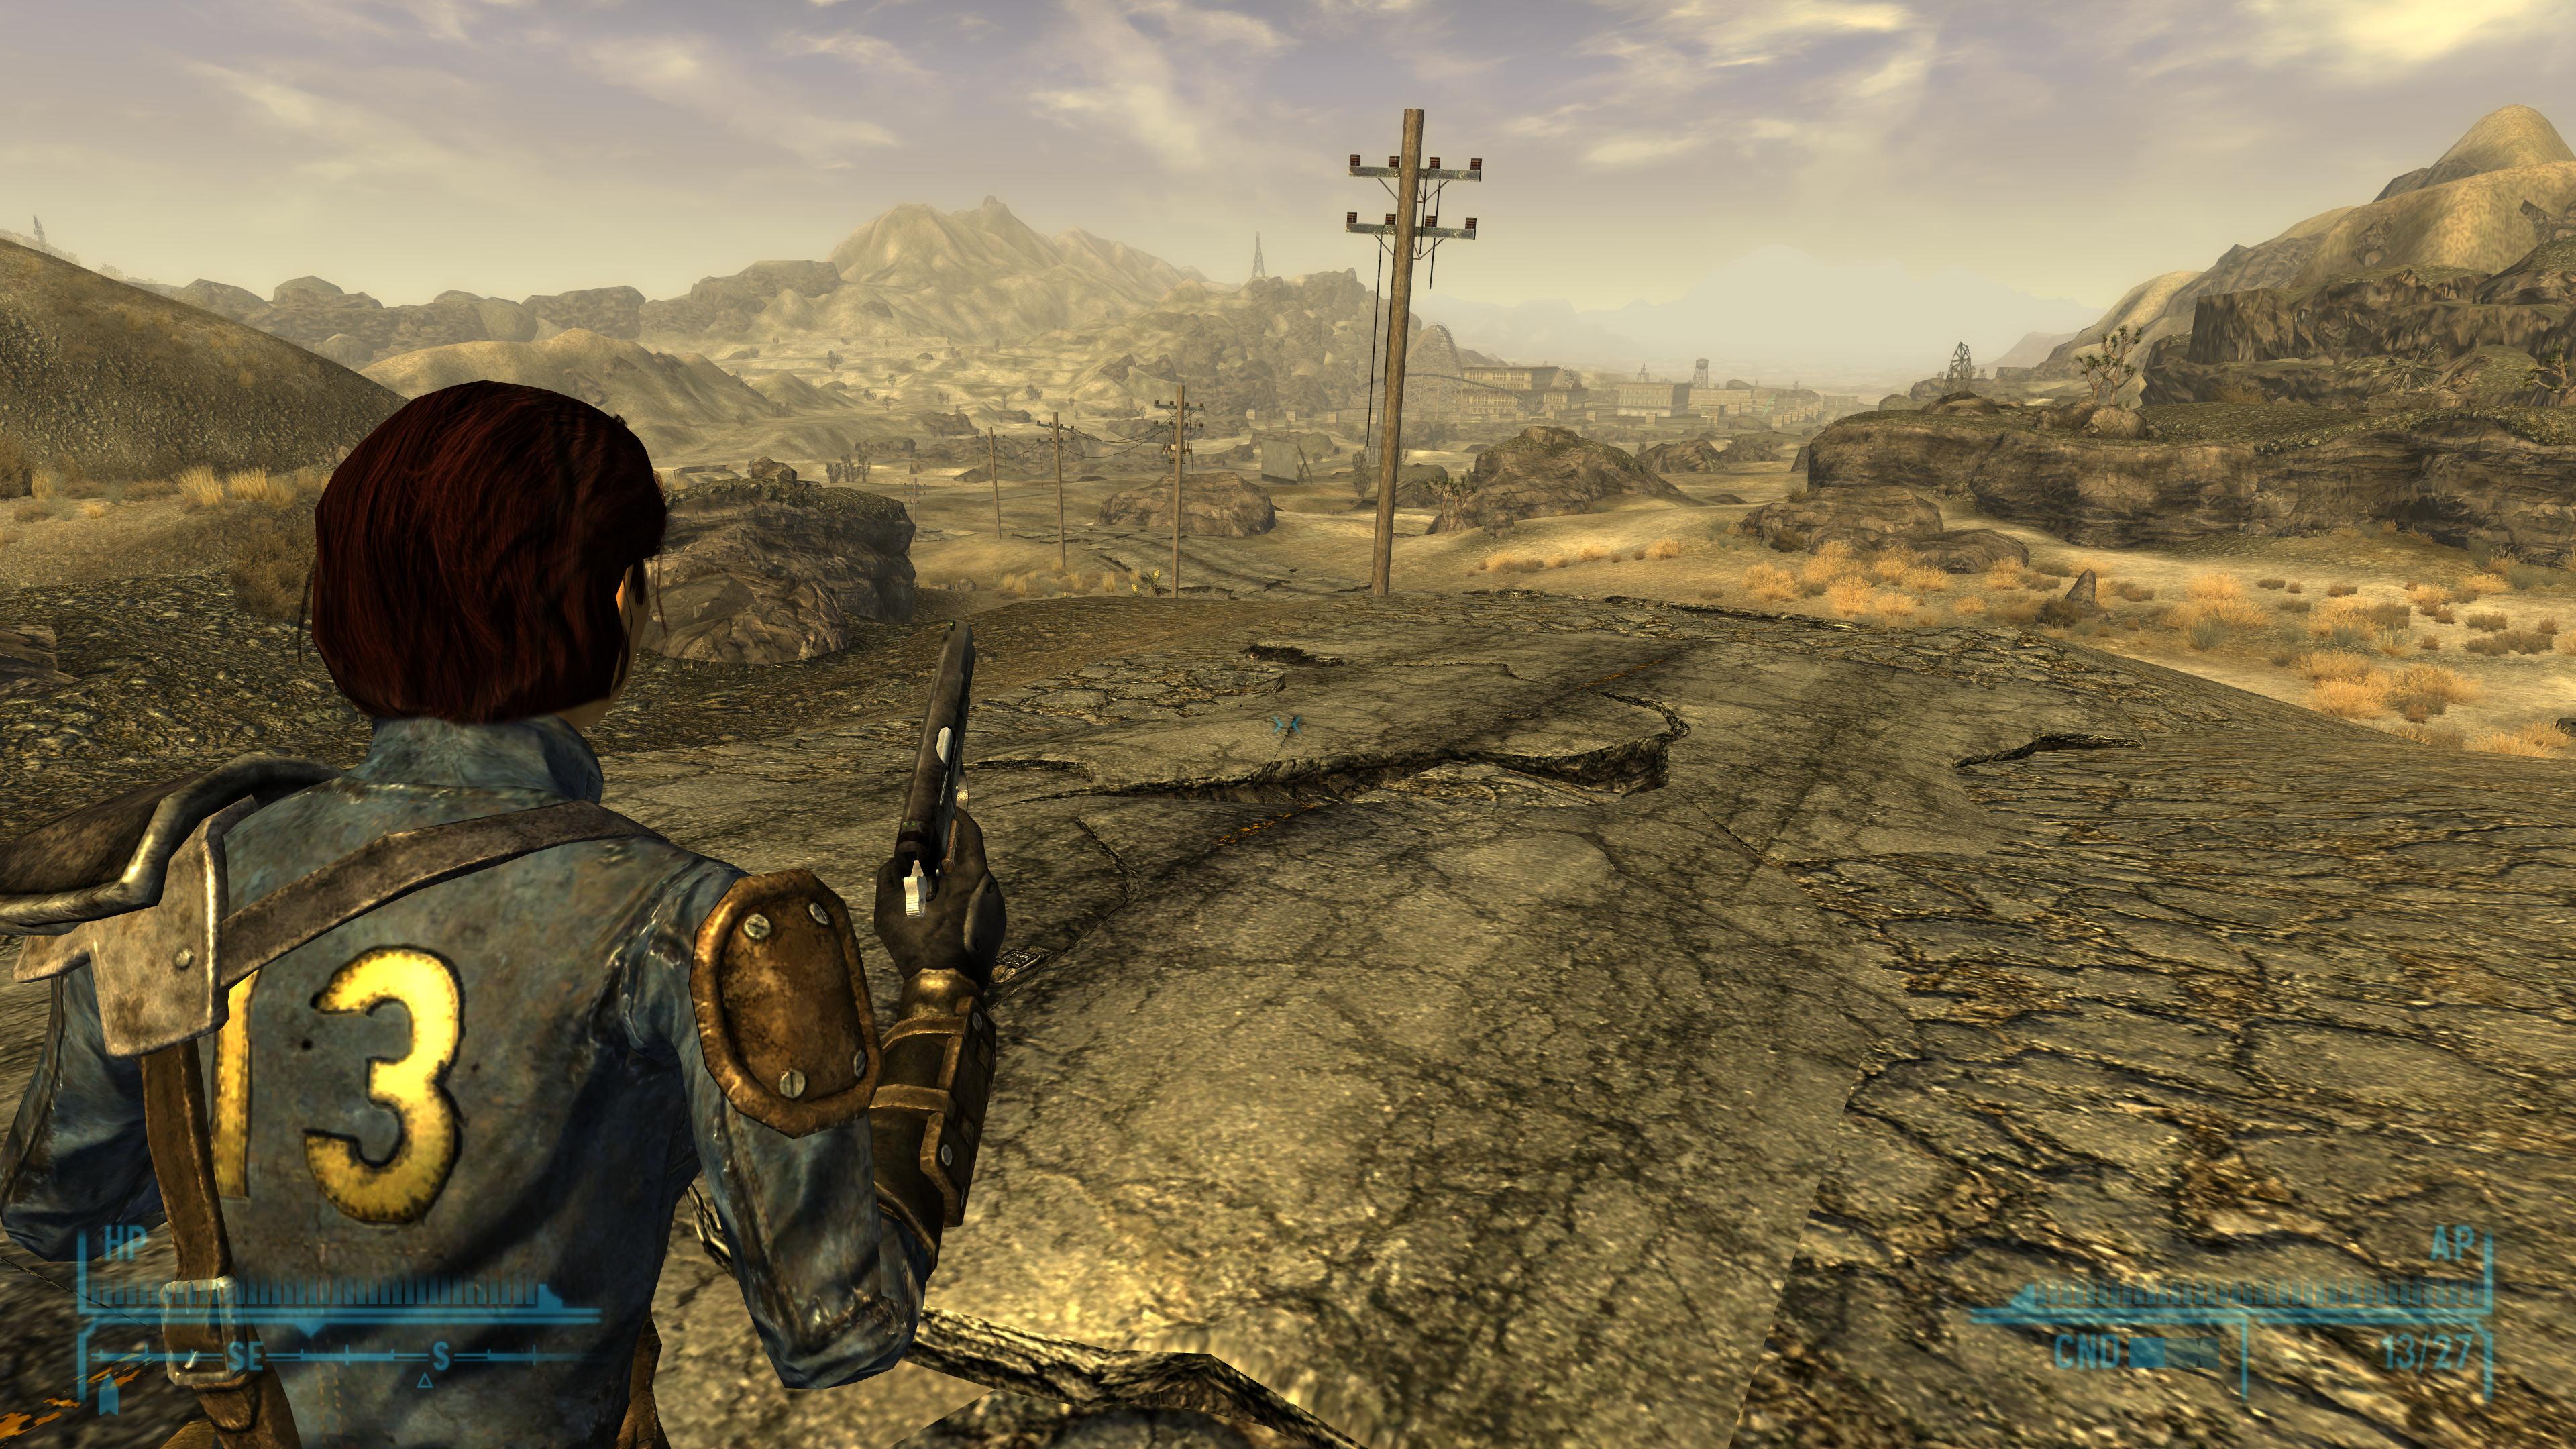 FalloutNV_2019-11-20_09-57-01-17.jpg